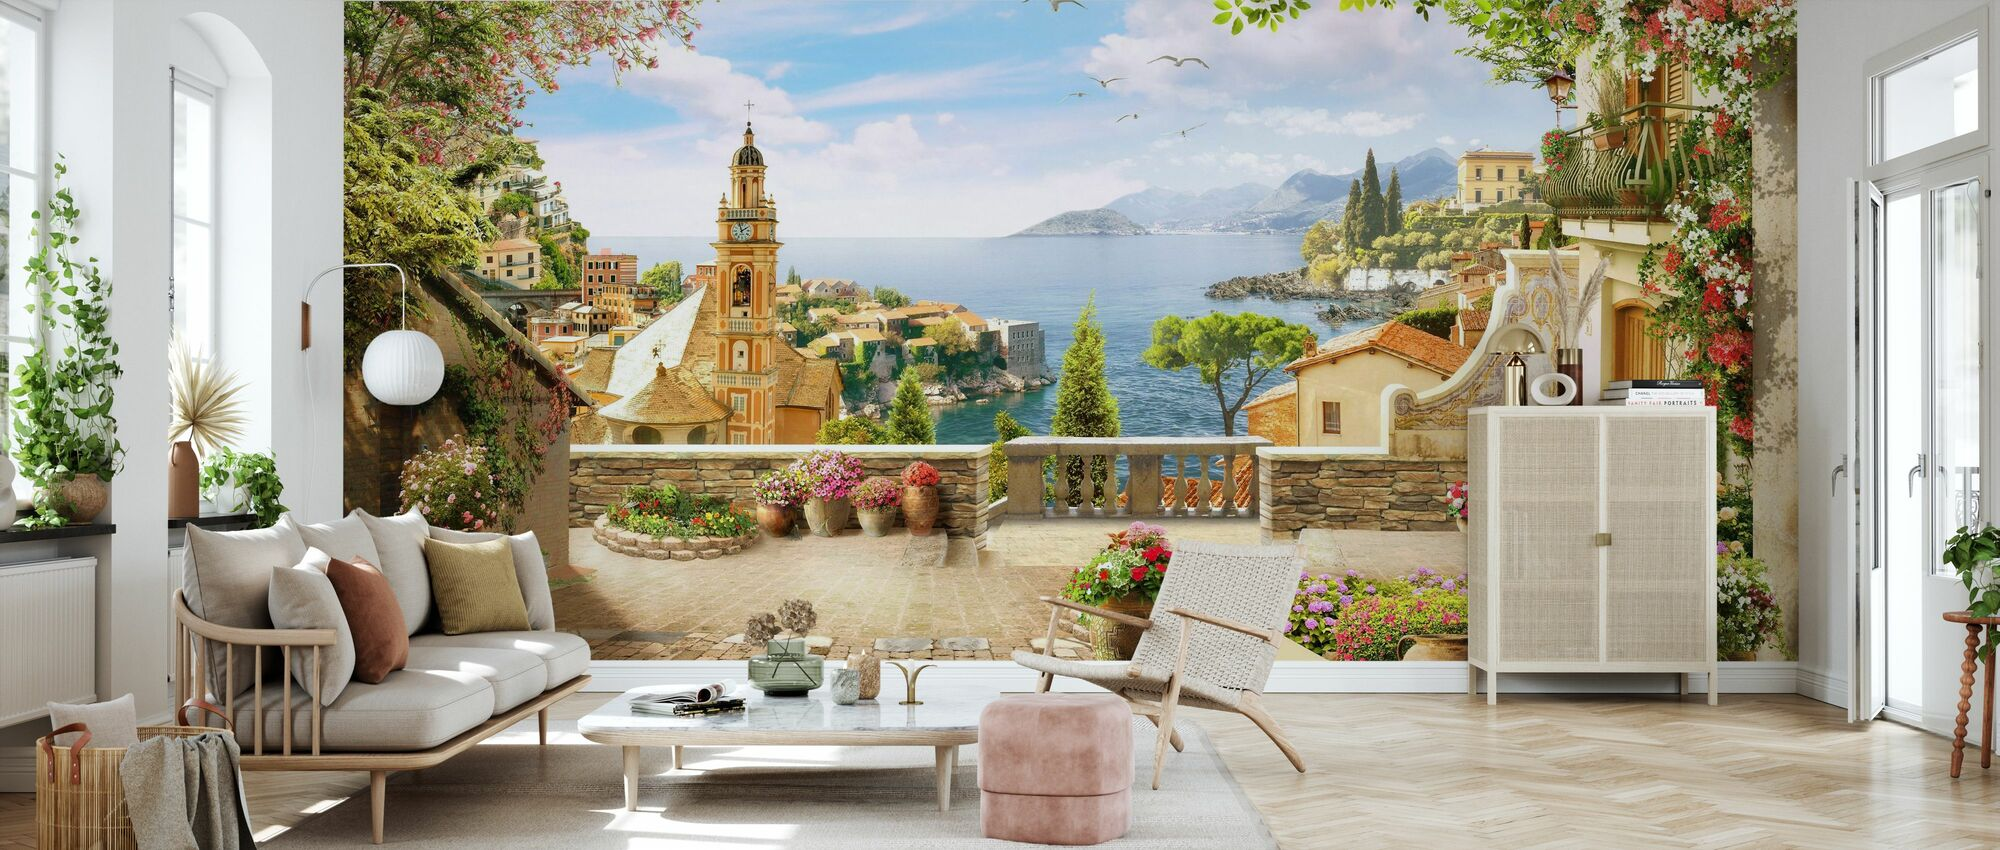 Stunning View of Amalfi - Wallpaper - Living Room